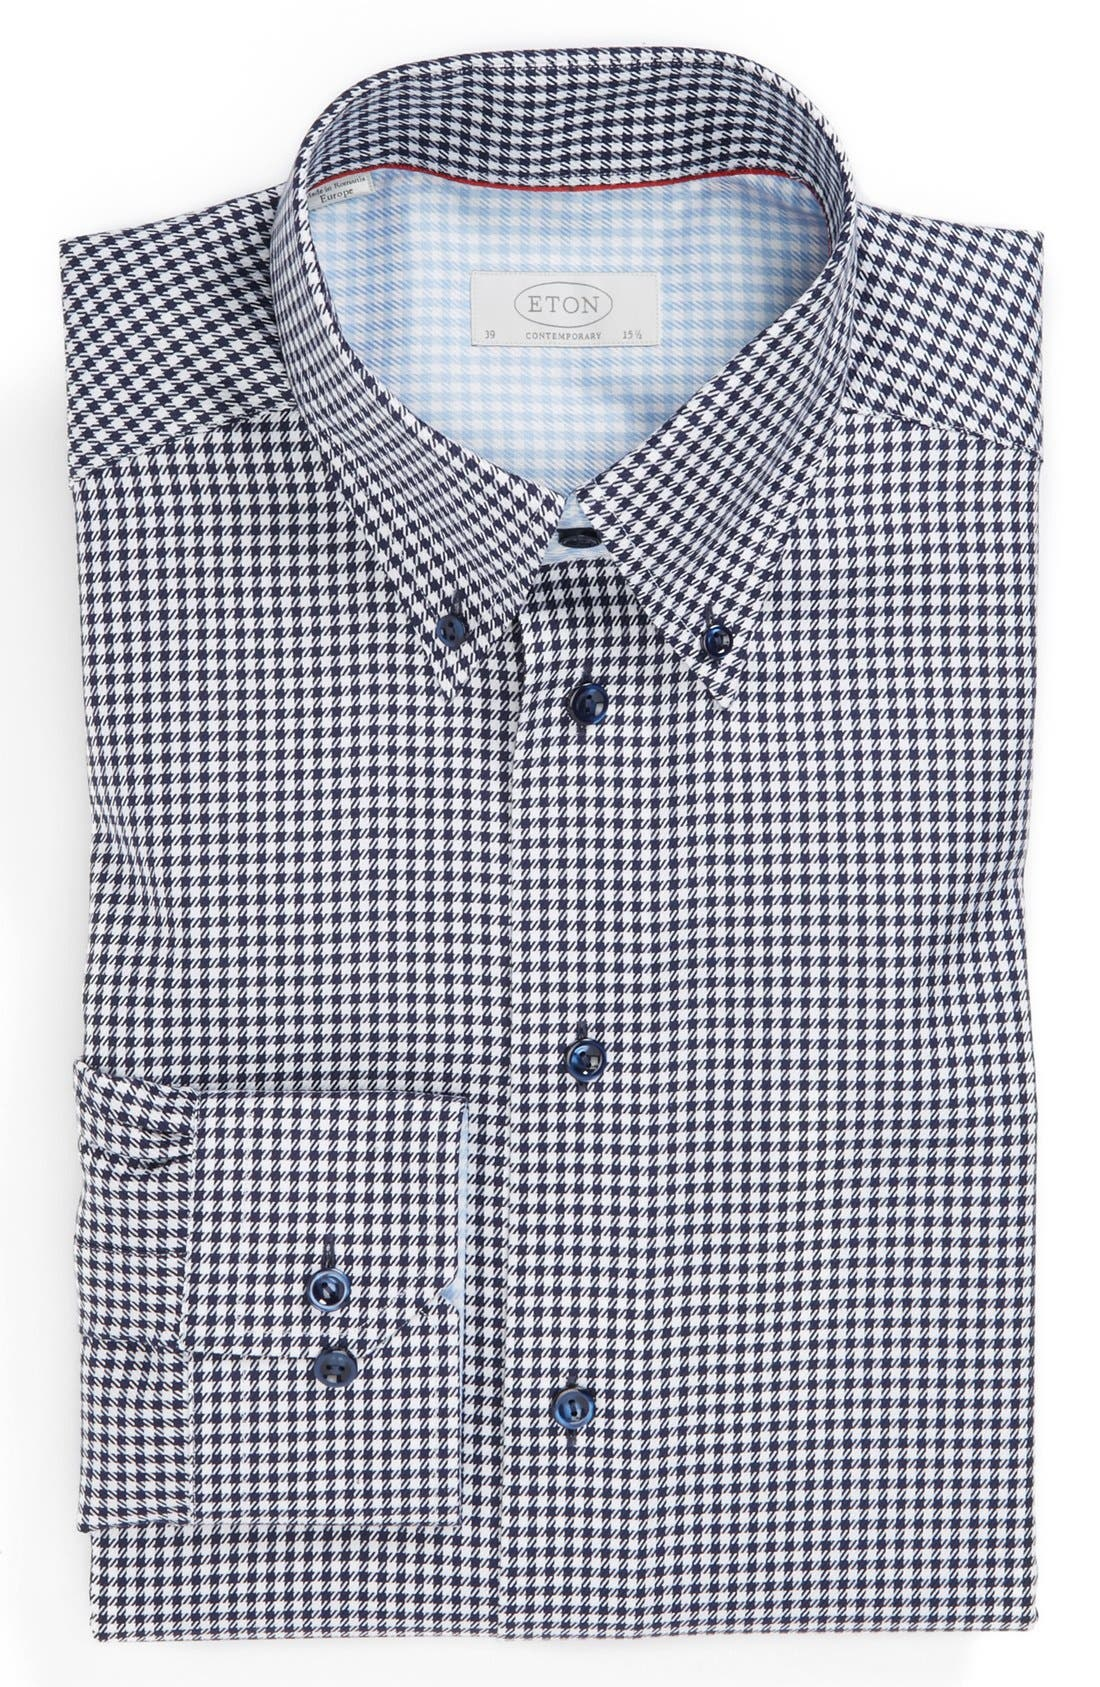 Main Image - Eton Contemporary Fit Non-Iron Dress Shirt